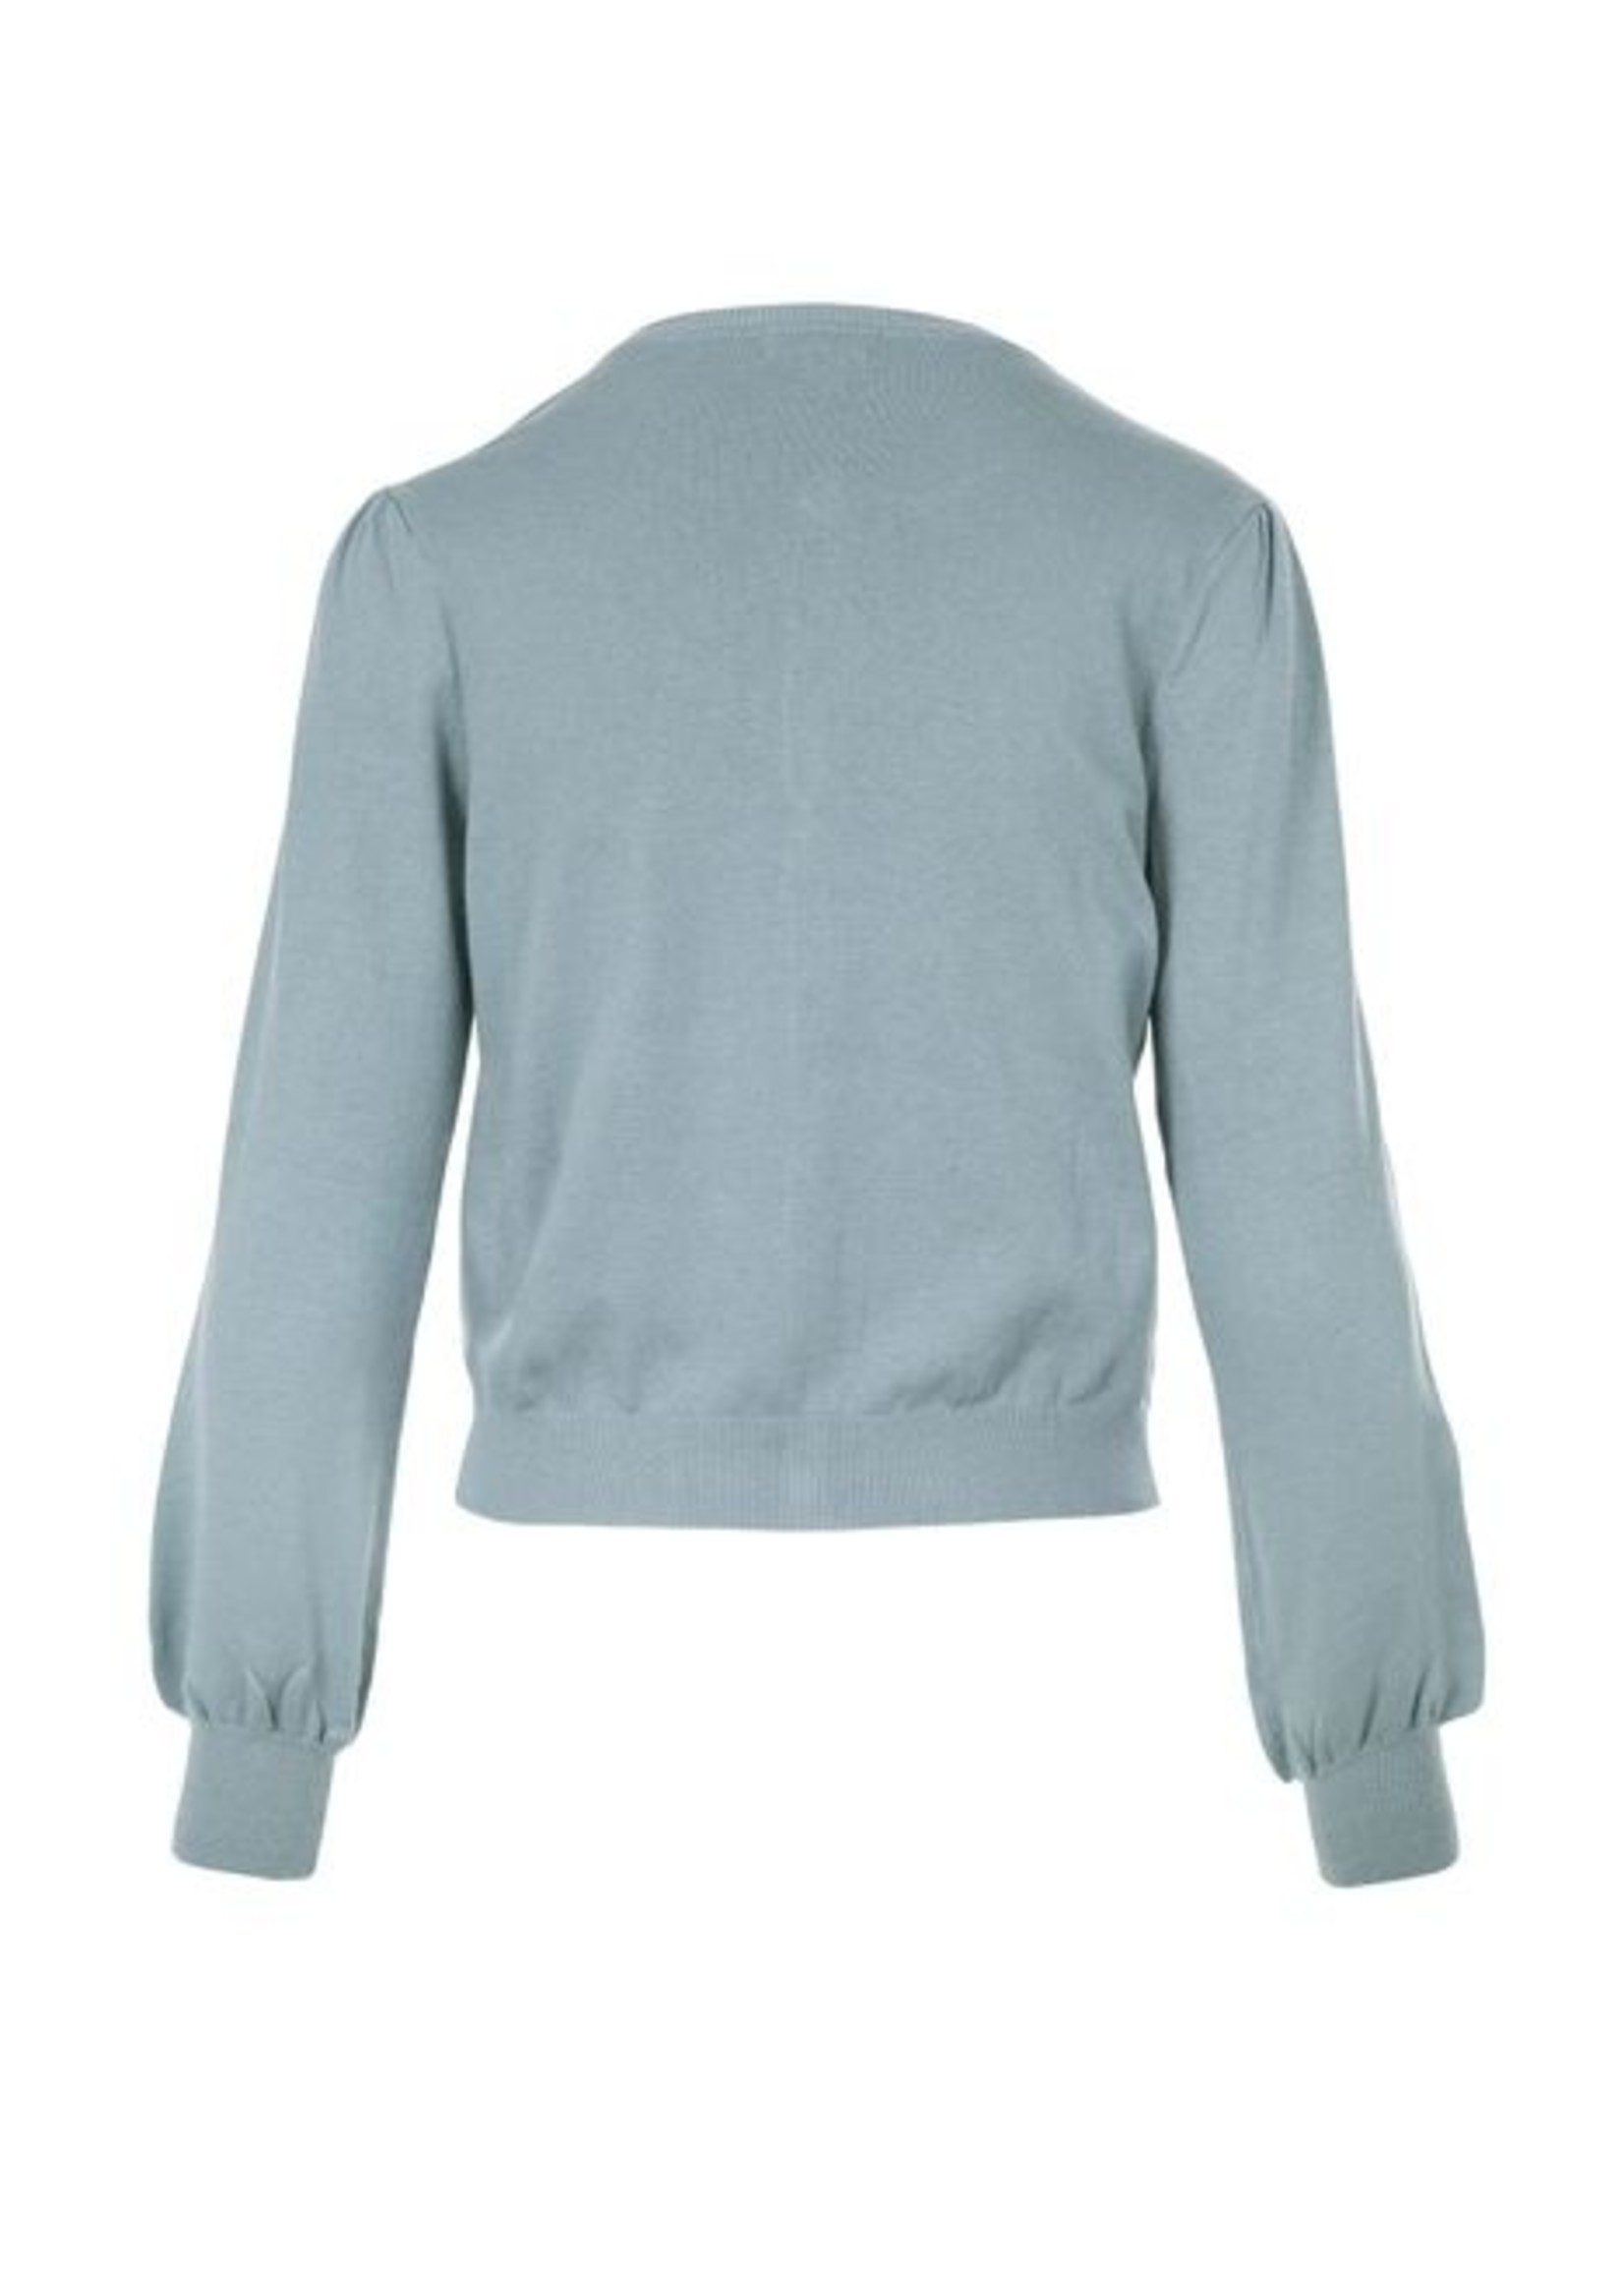 ZUSSS Basic vestje grijs-blauw